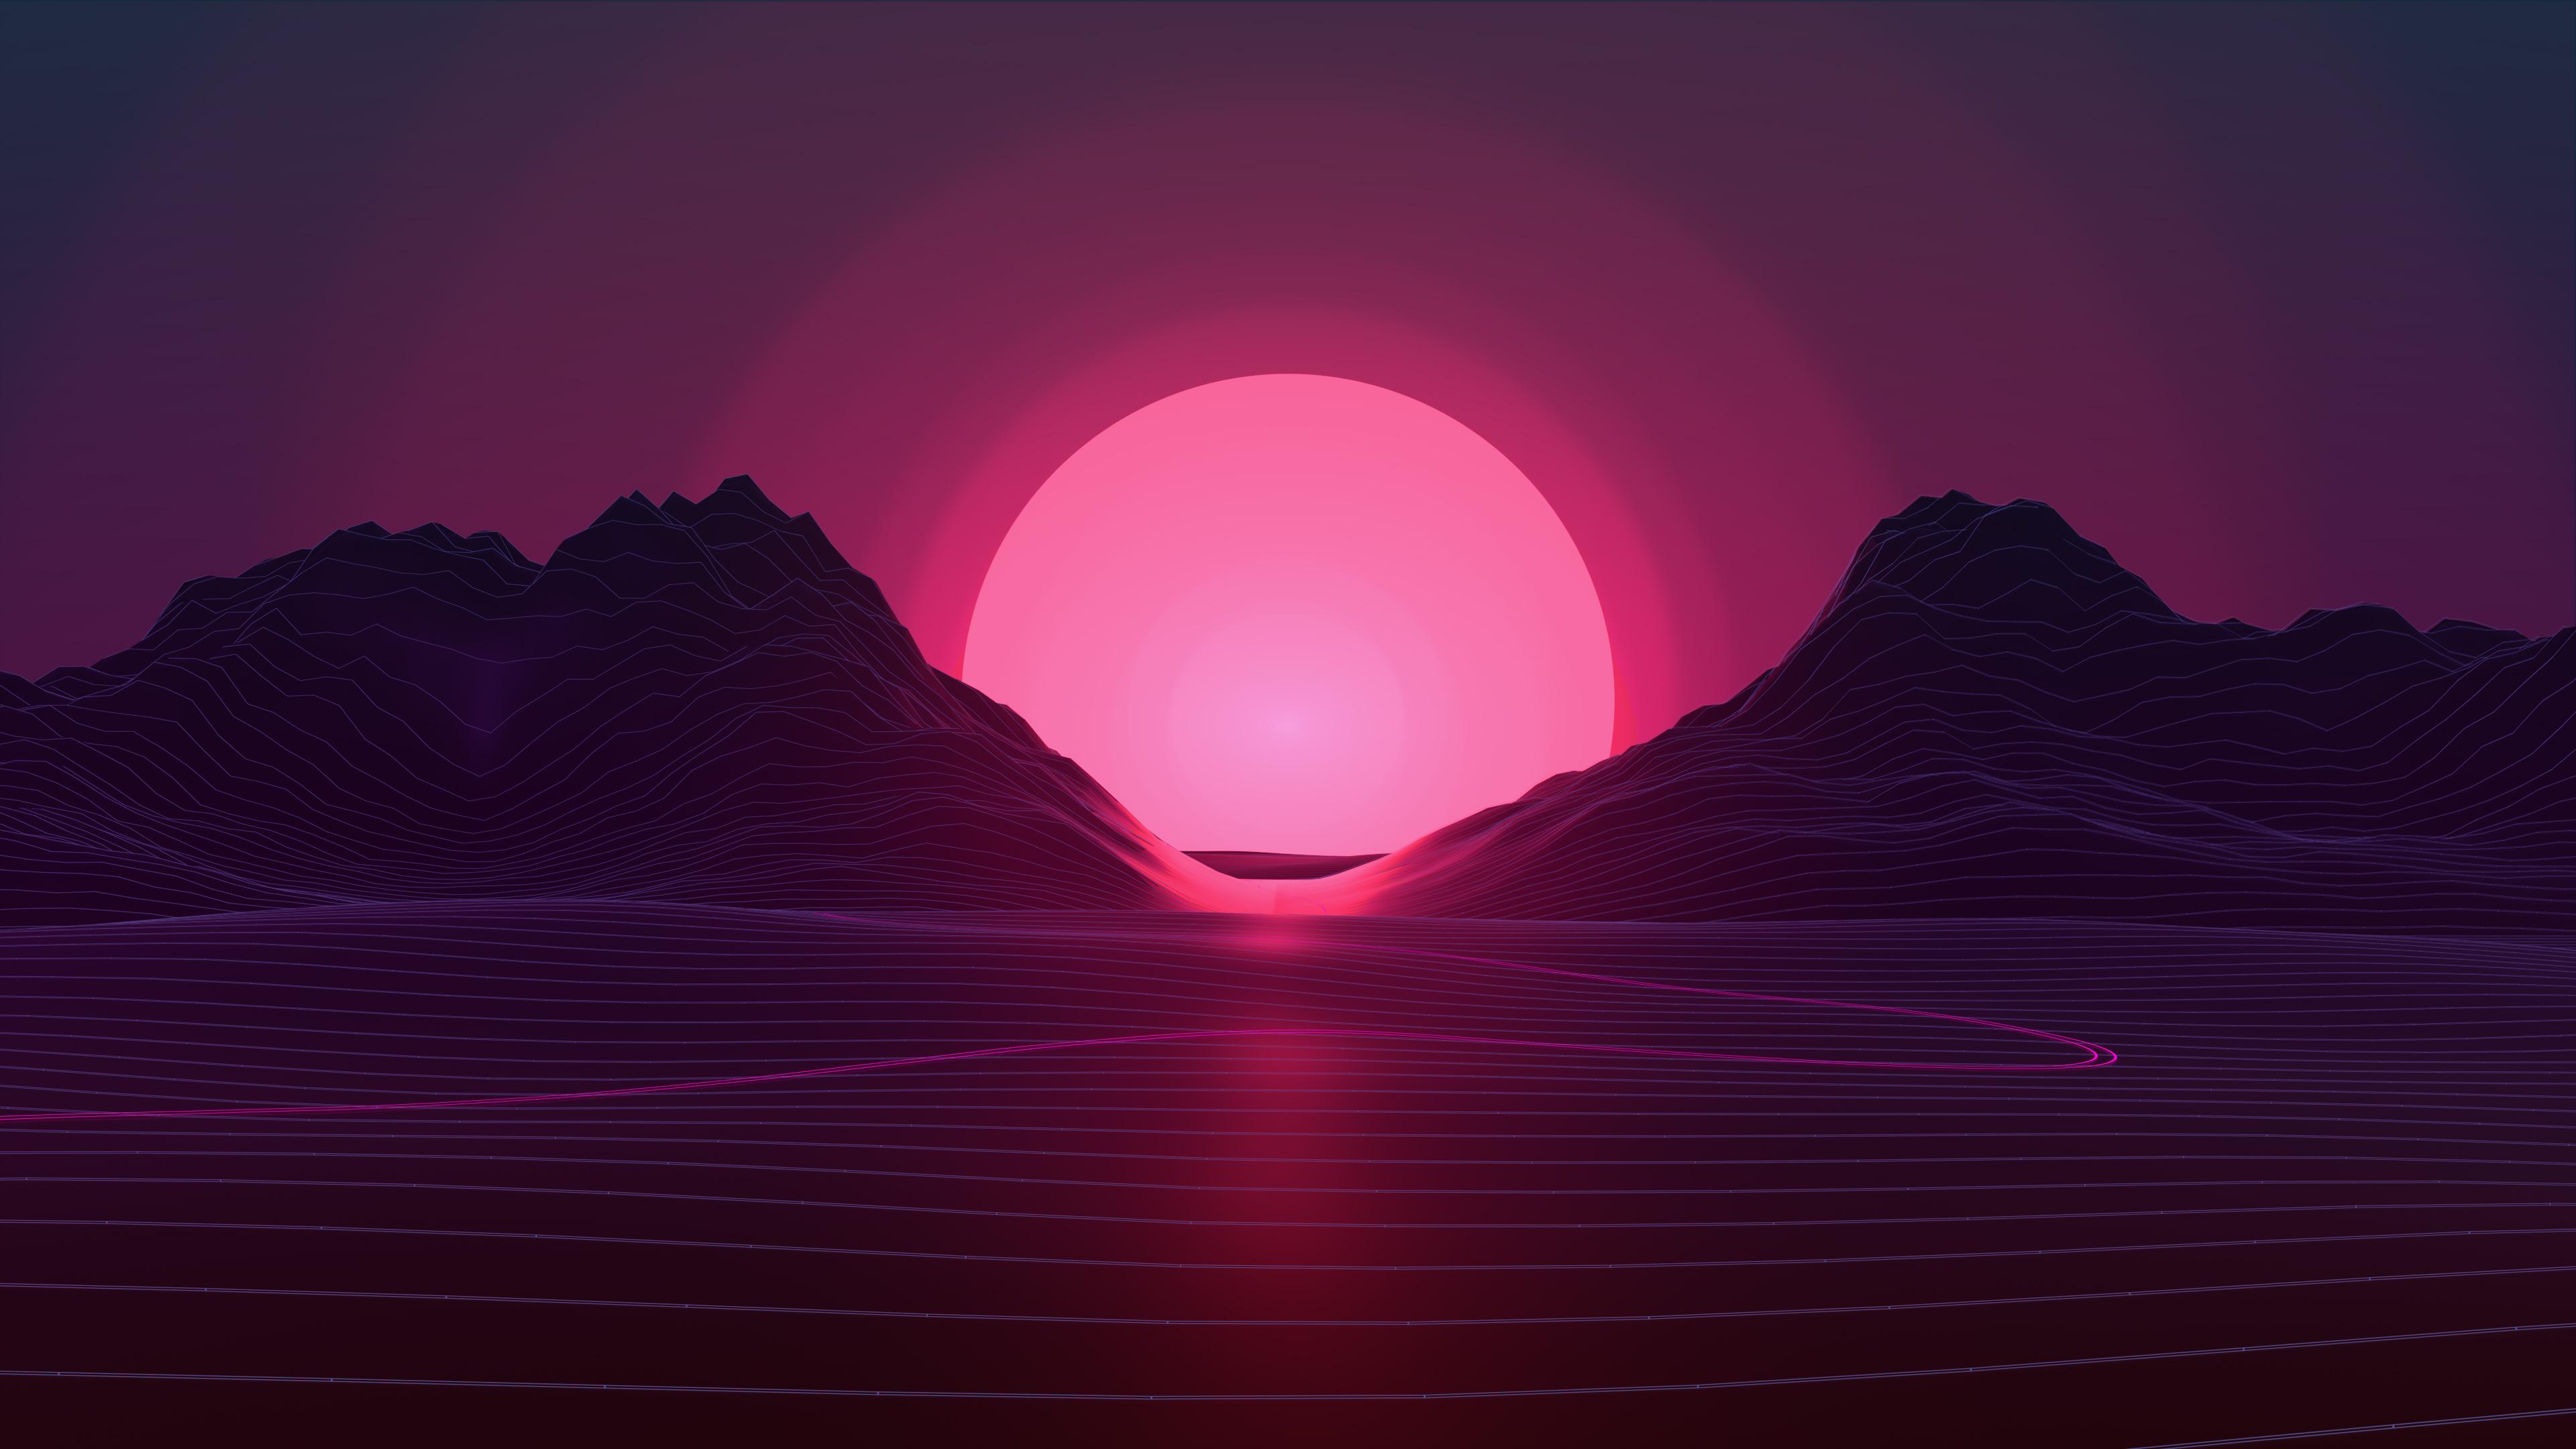 Sun In Retro Wave Mountains Wallpaper HD Artist 4K Wallpapers 3840x2160